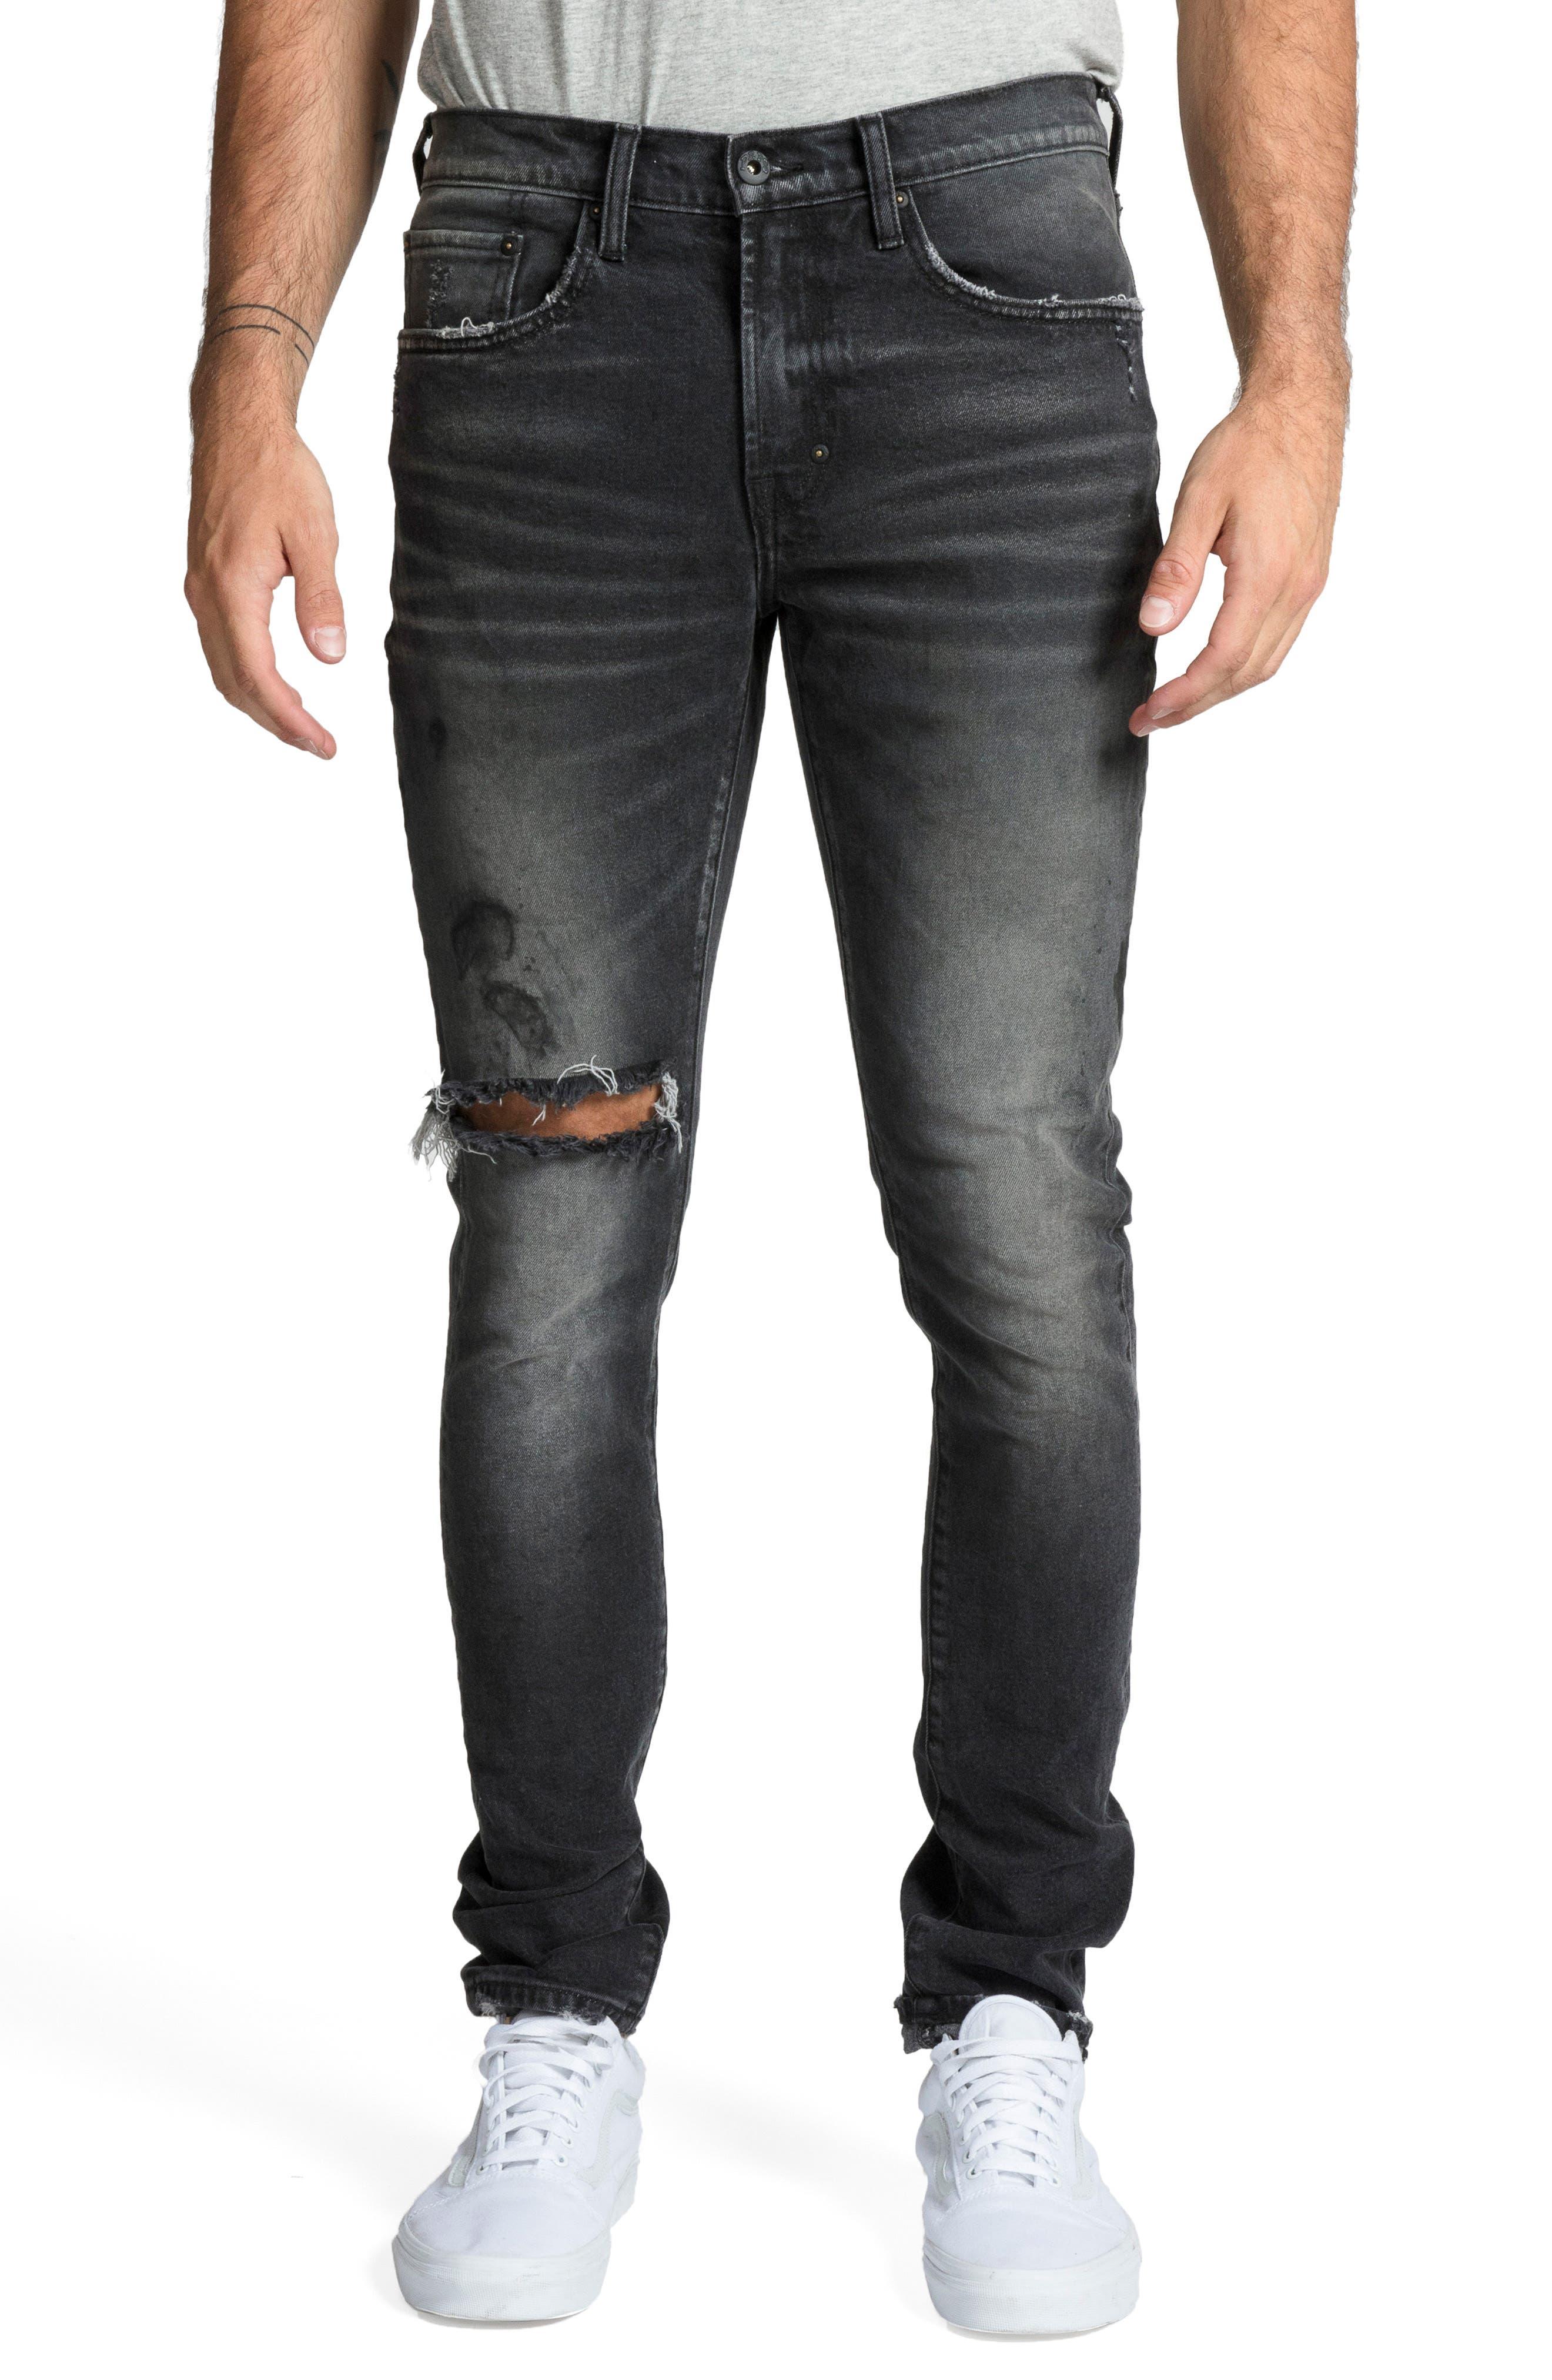 Windsor Skinny Fit Jeans,                             Main thumbnail 1, color,                             RESOLUTE